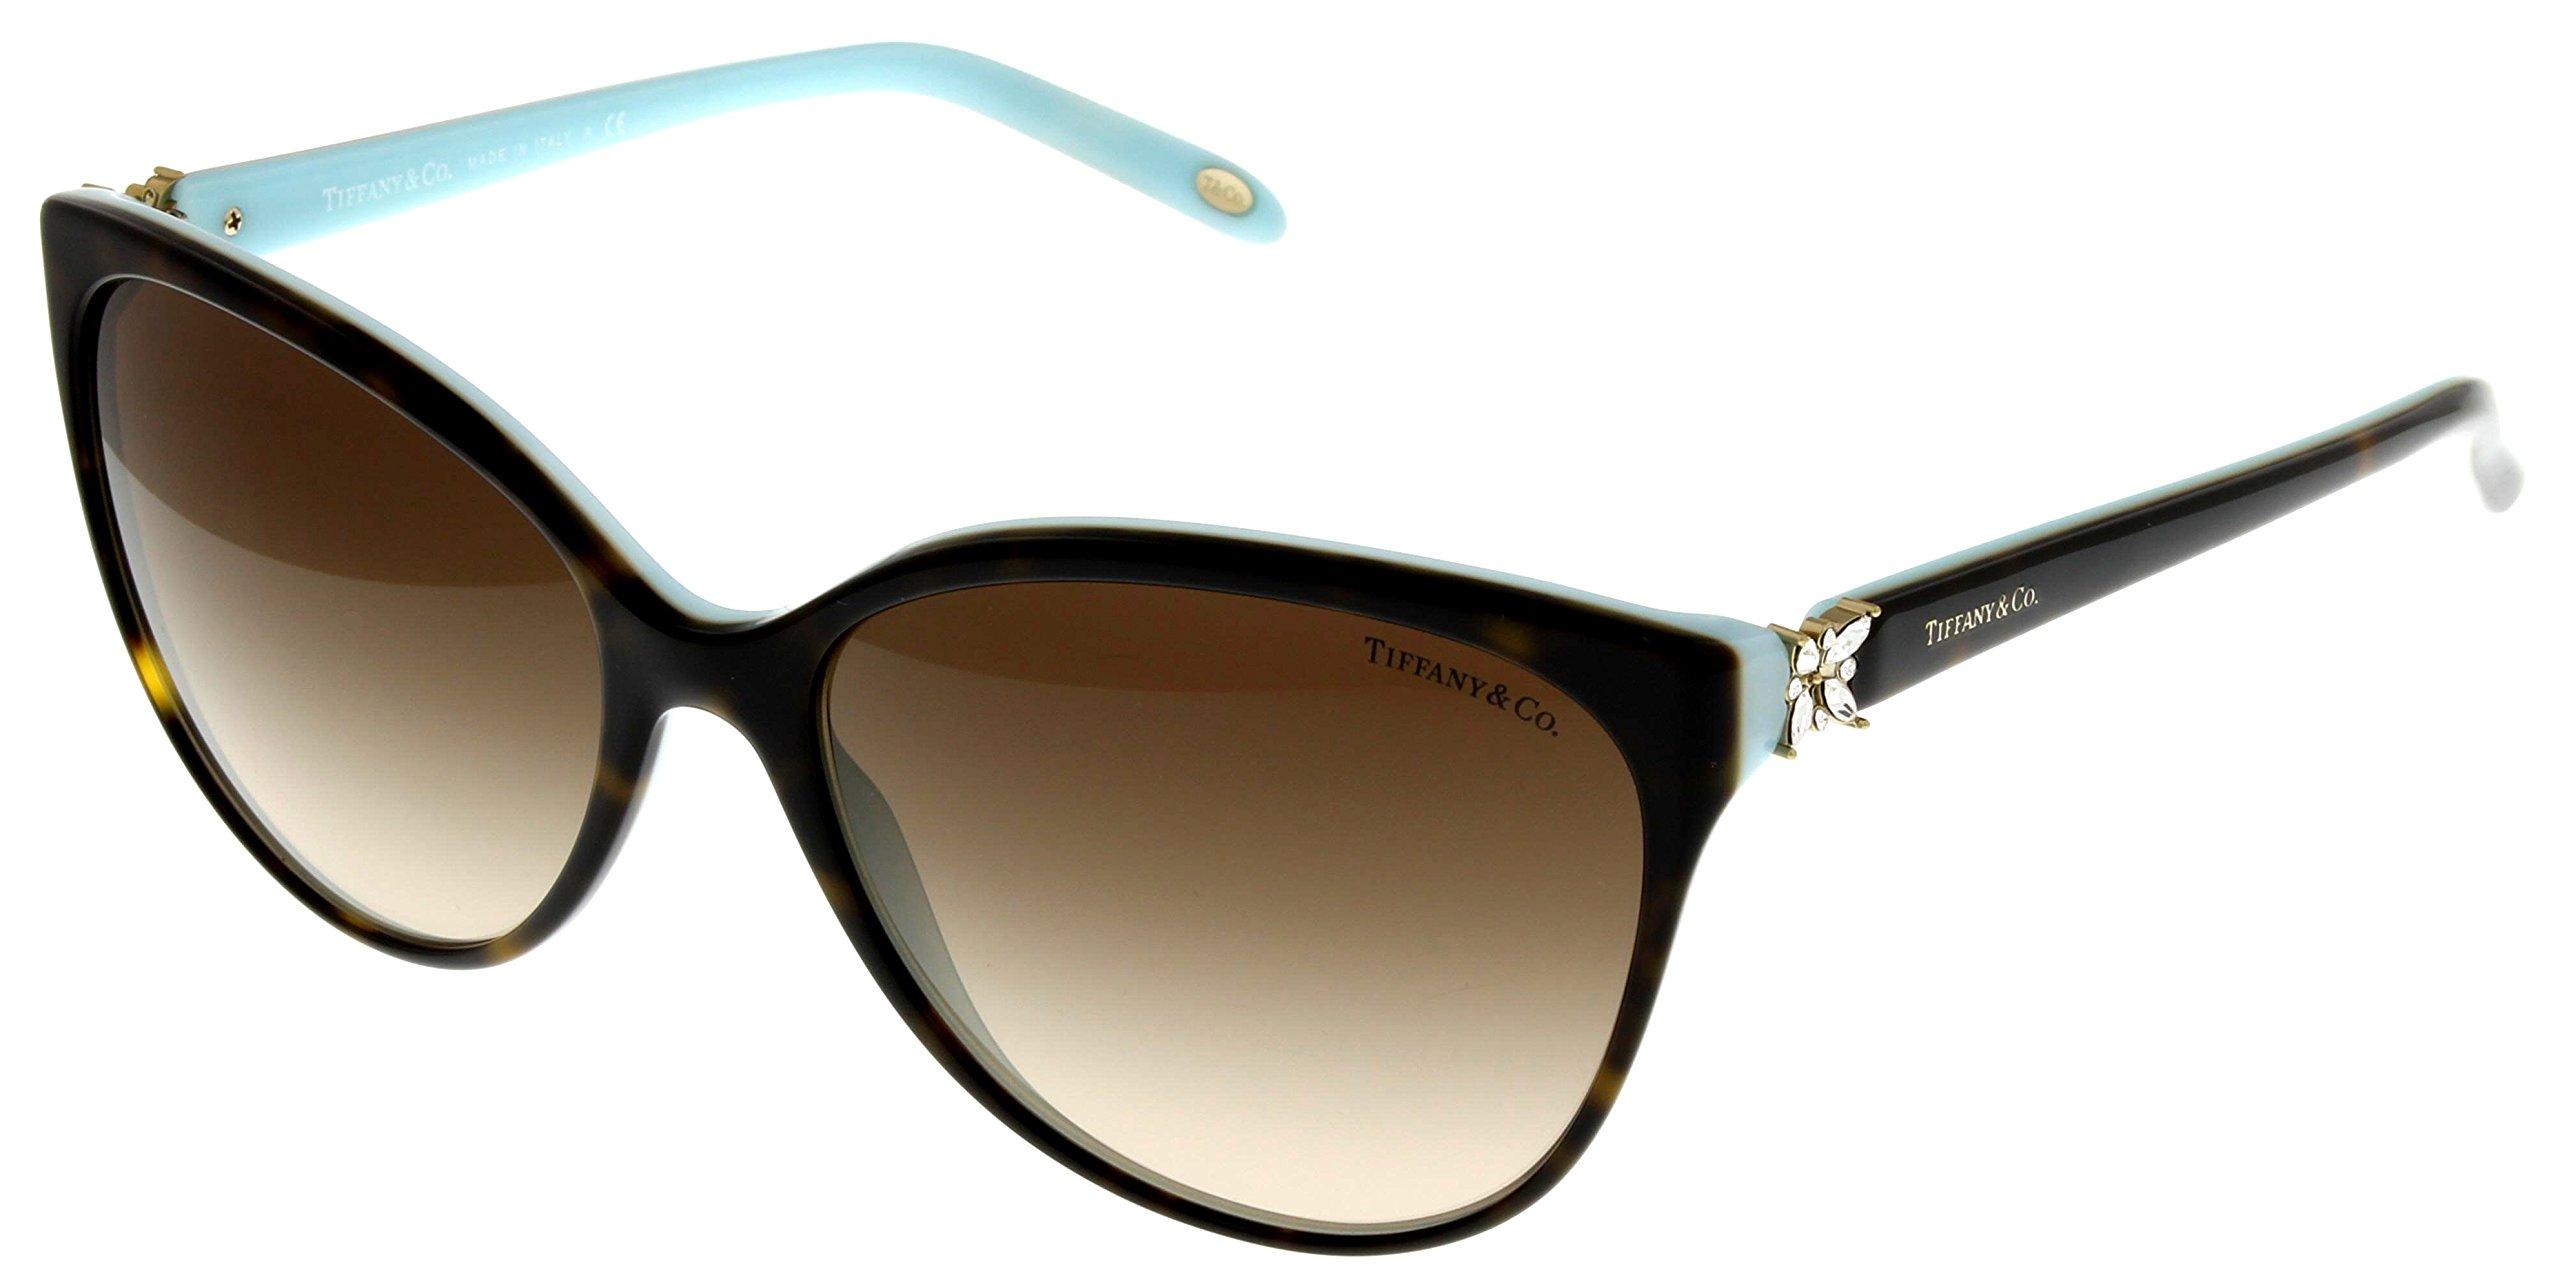 Tiffany & Co Sunglasses Womens Tortoise Butterfly TF4089B 81343B